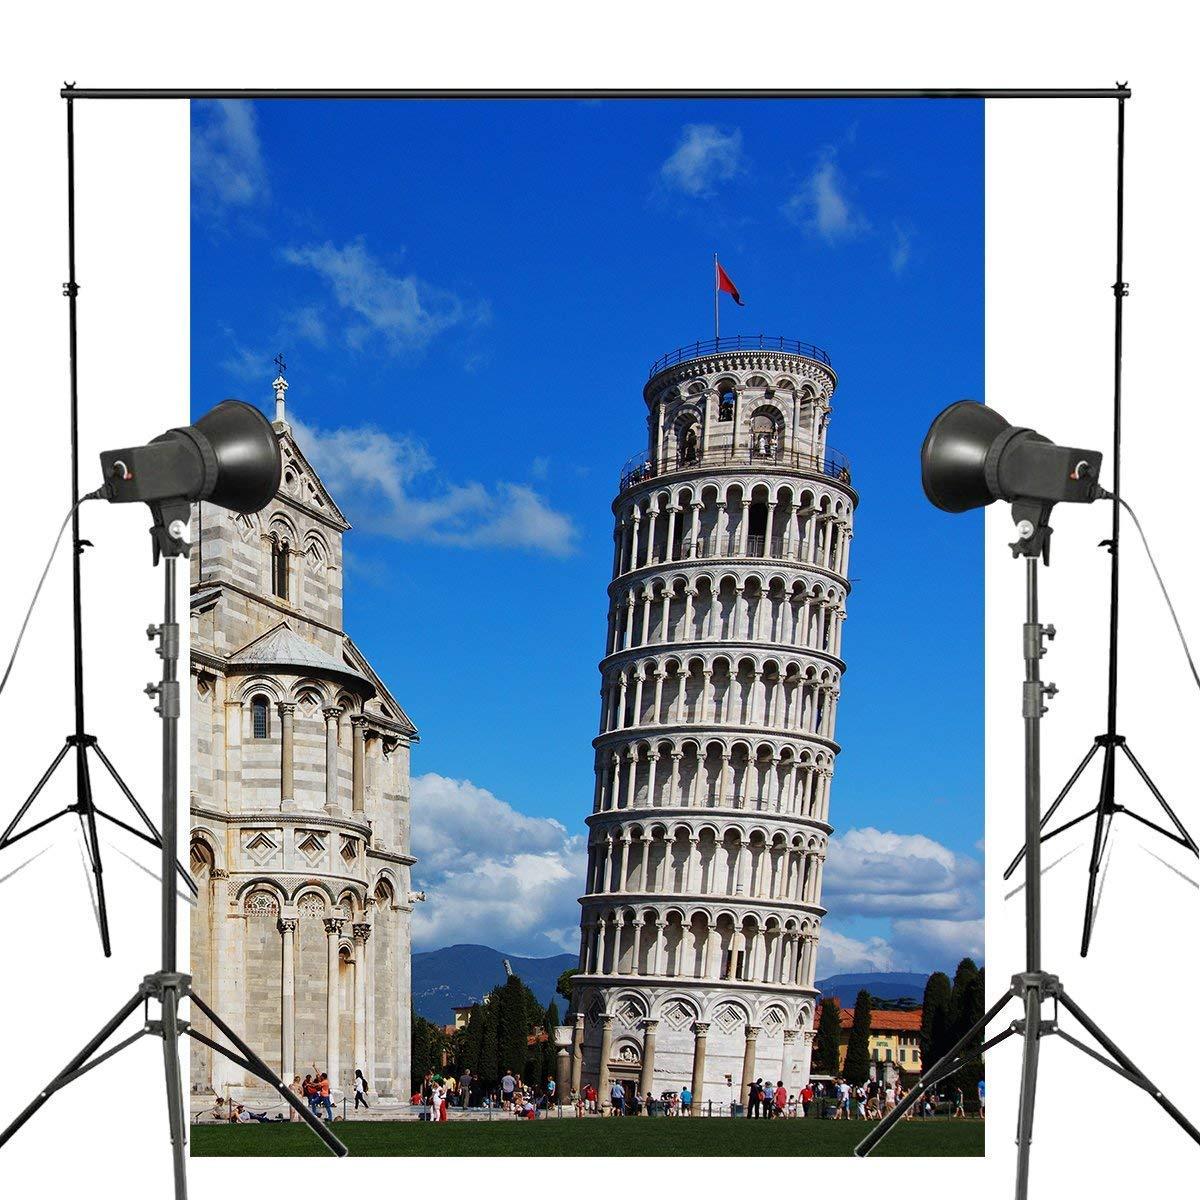 ERTIANANG 150x220cm European Building Photography Background Italy Pisa Leaning Tower Backdrop European Theme Photo Studio Background